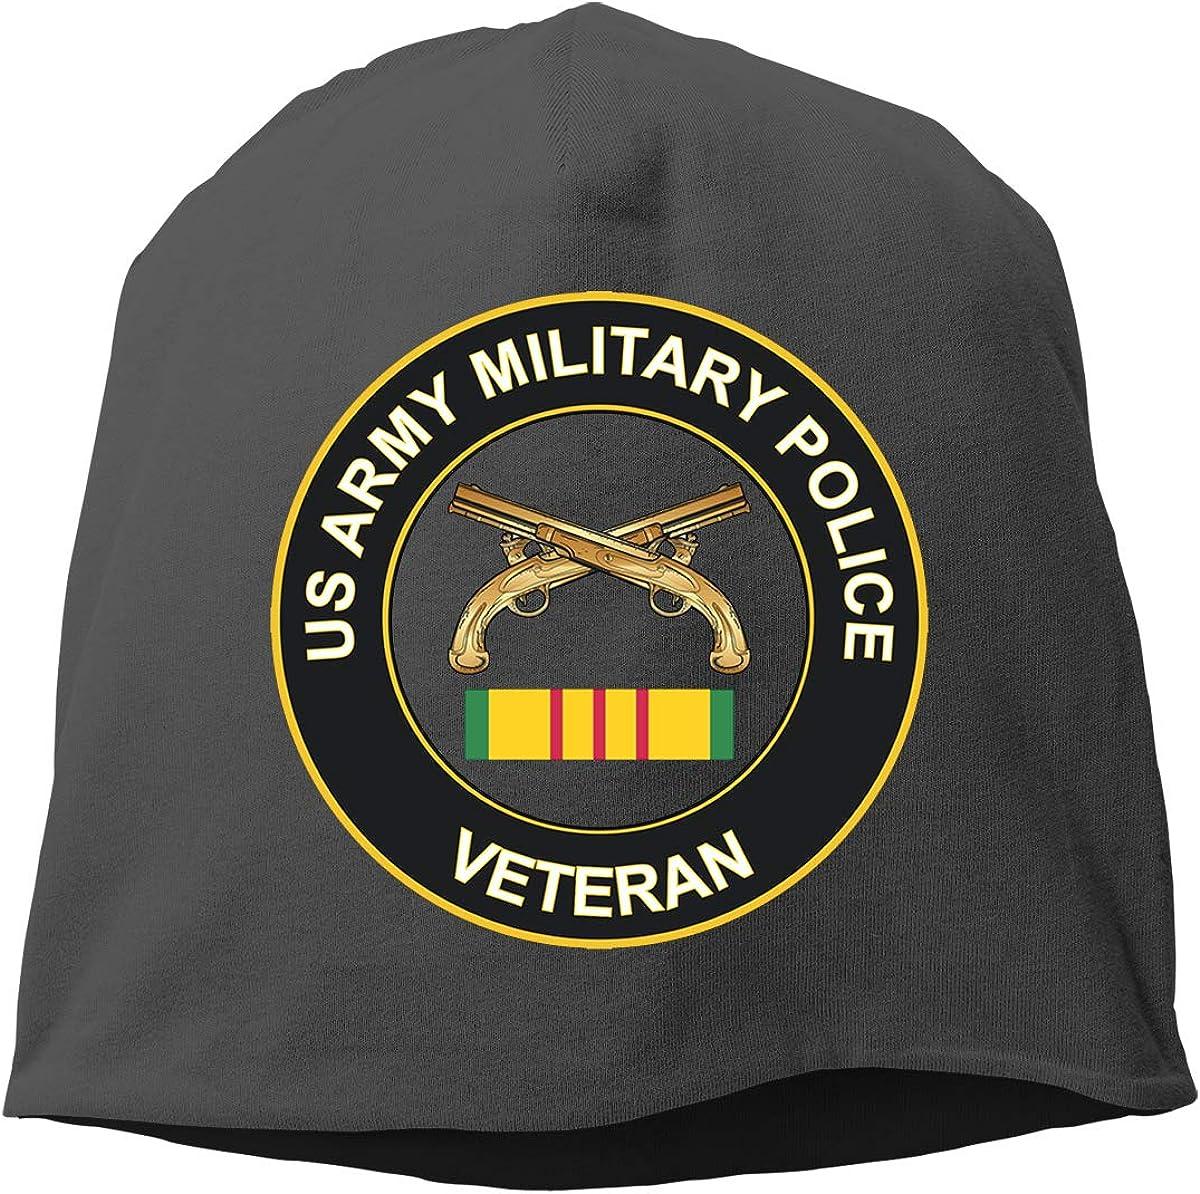 Army Military Police Vietnam Veteran Unisex Knitted Hat Beanie Hat Warm Hats Skull Cap Beanie Hat